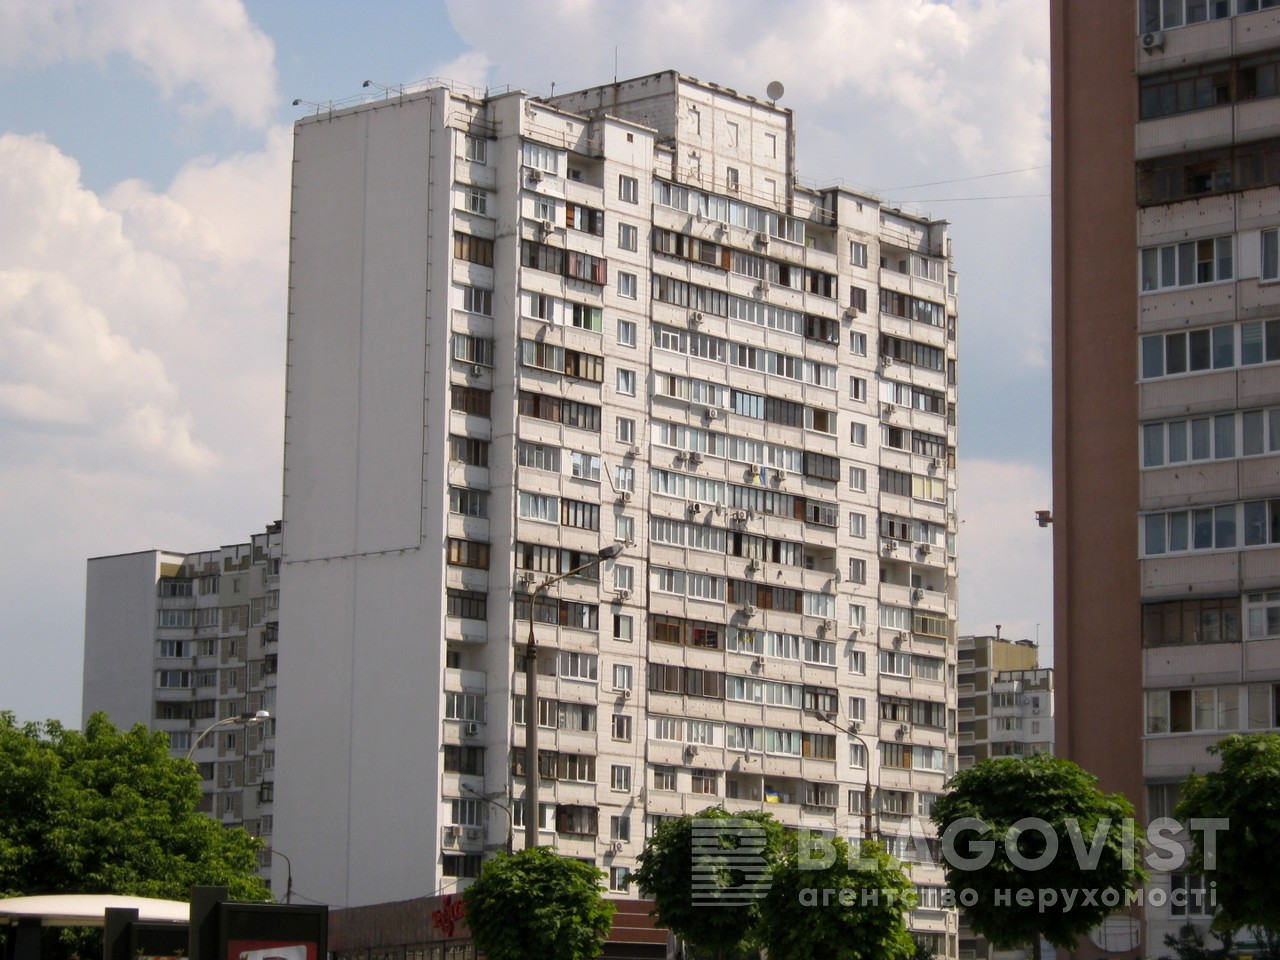 Квартира R-39492, Гришко Михаила, 10, Киев - Фото 1